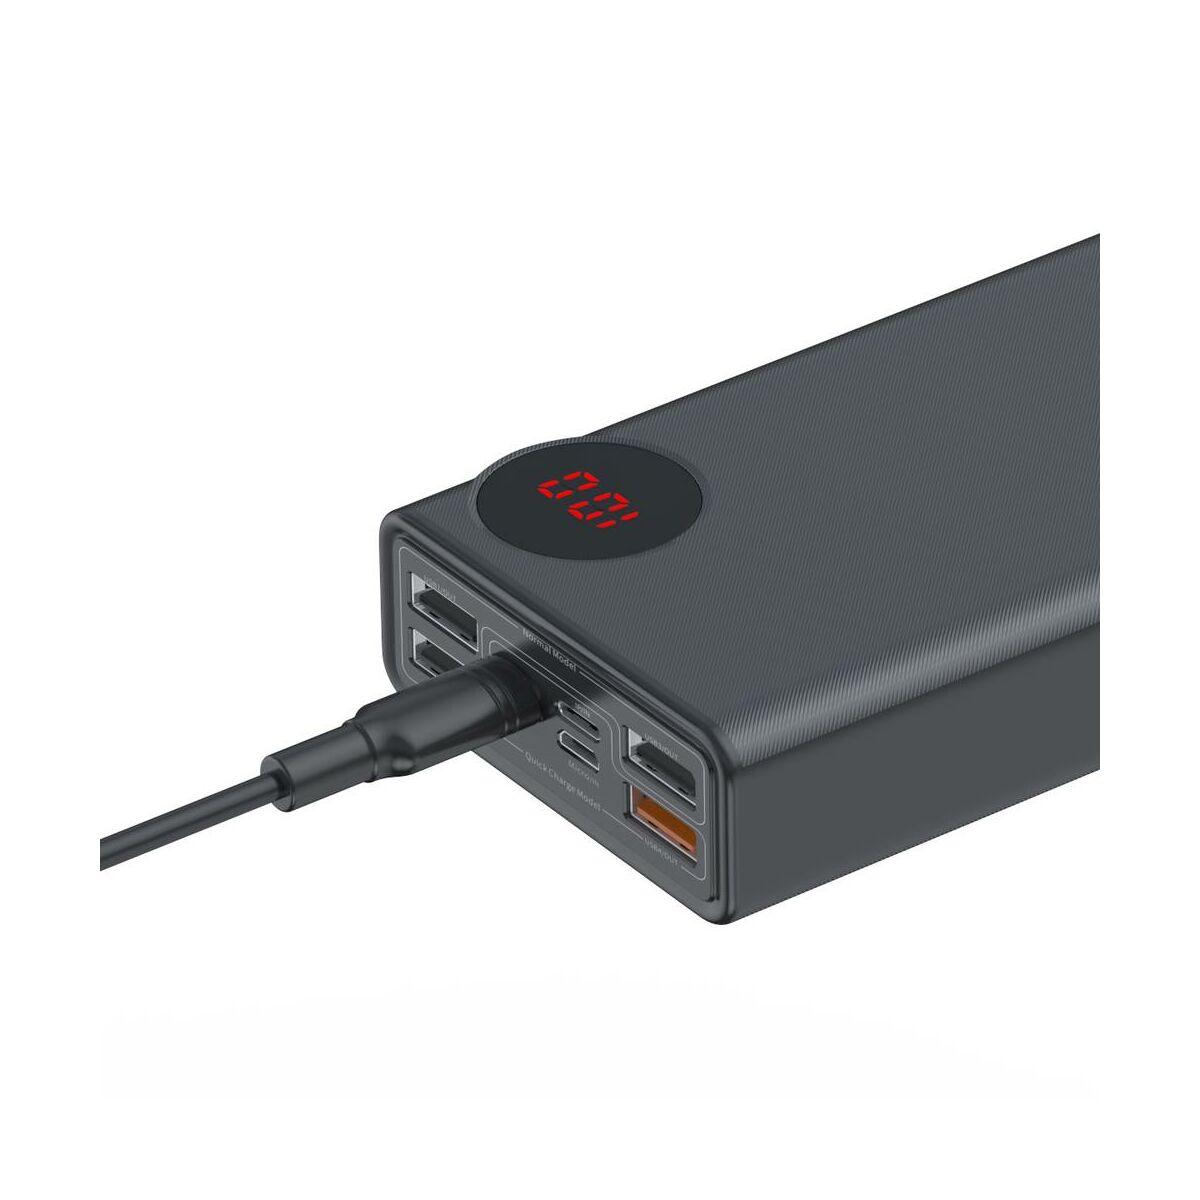 Baseus Power Bank Mulight Quick Charge digitális kijelzővel PD3.0 QC3.0 33W, 30000 mAh, fekete (PPMY-01)